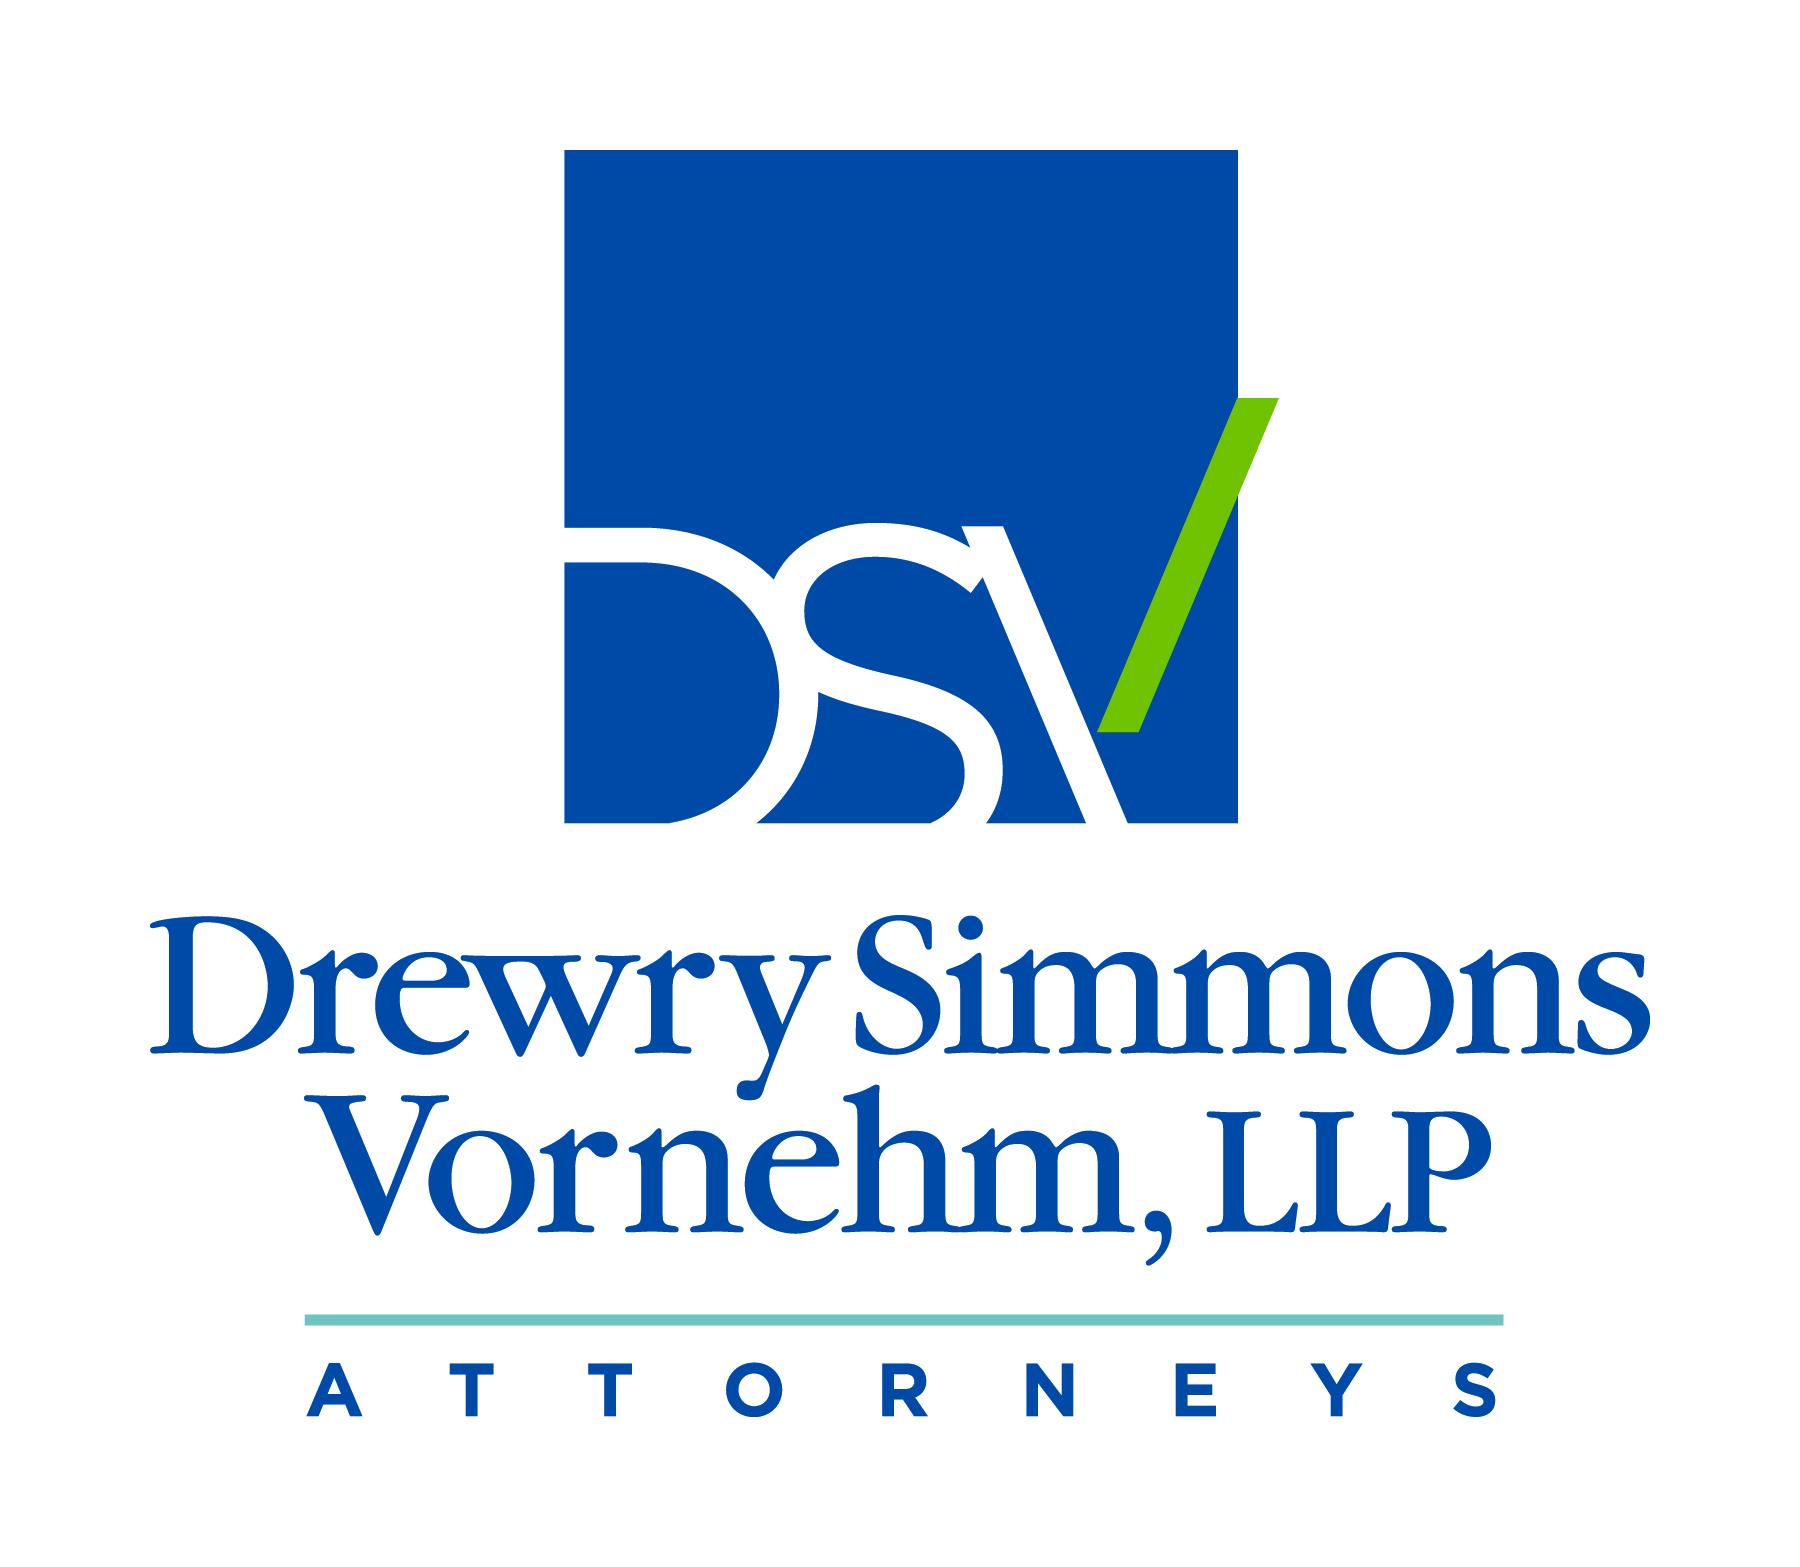 Drewry Simmons Vornehm